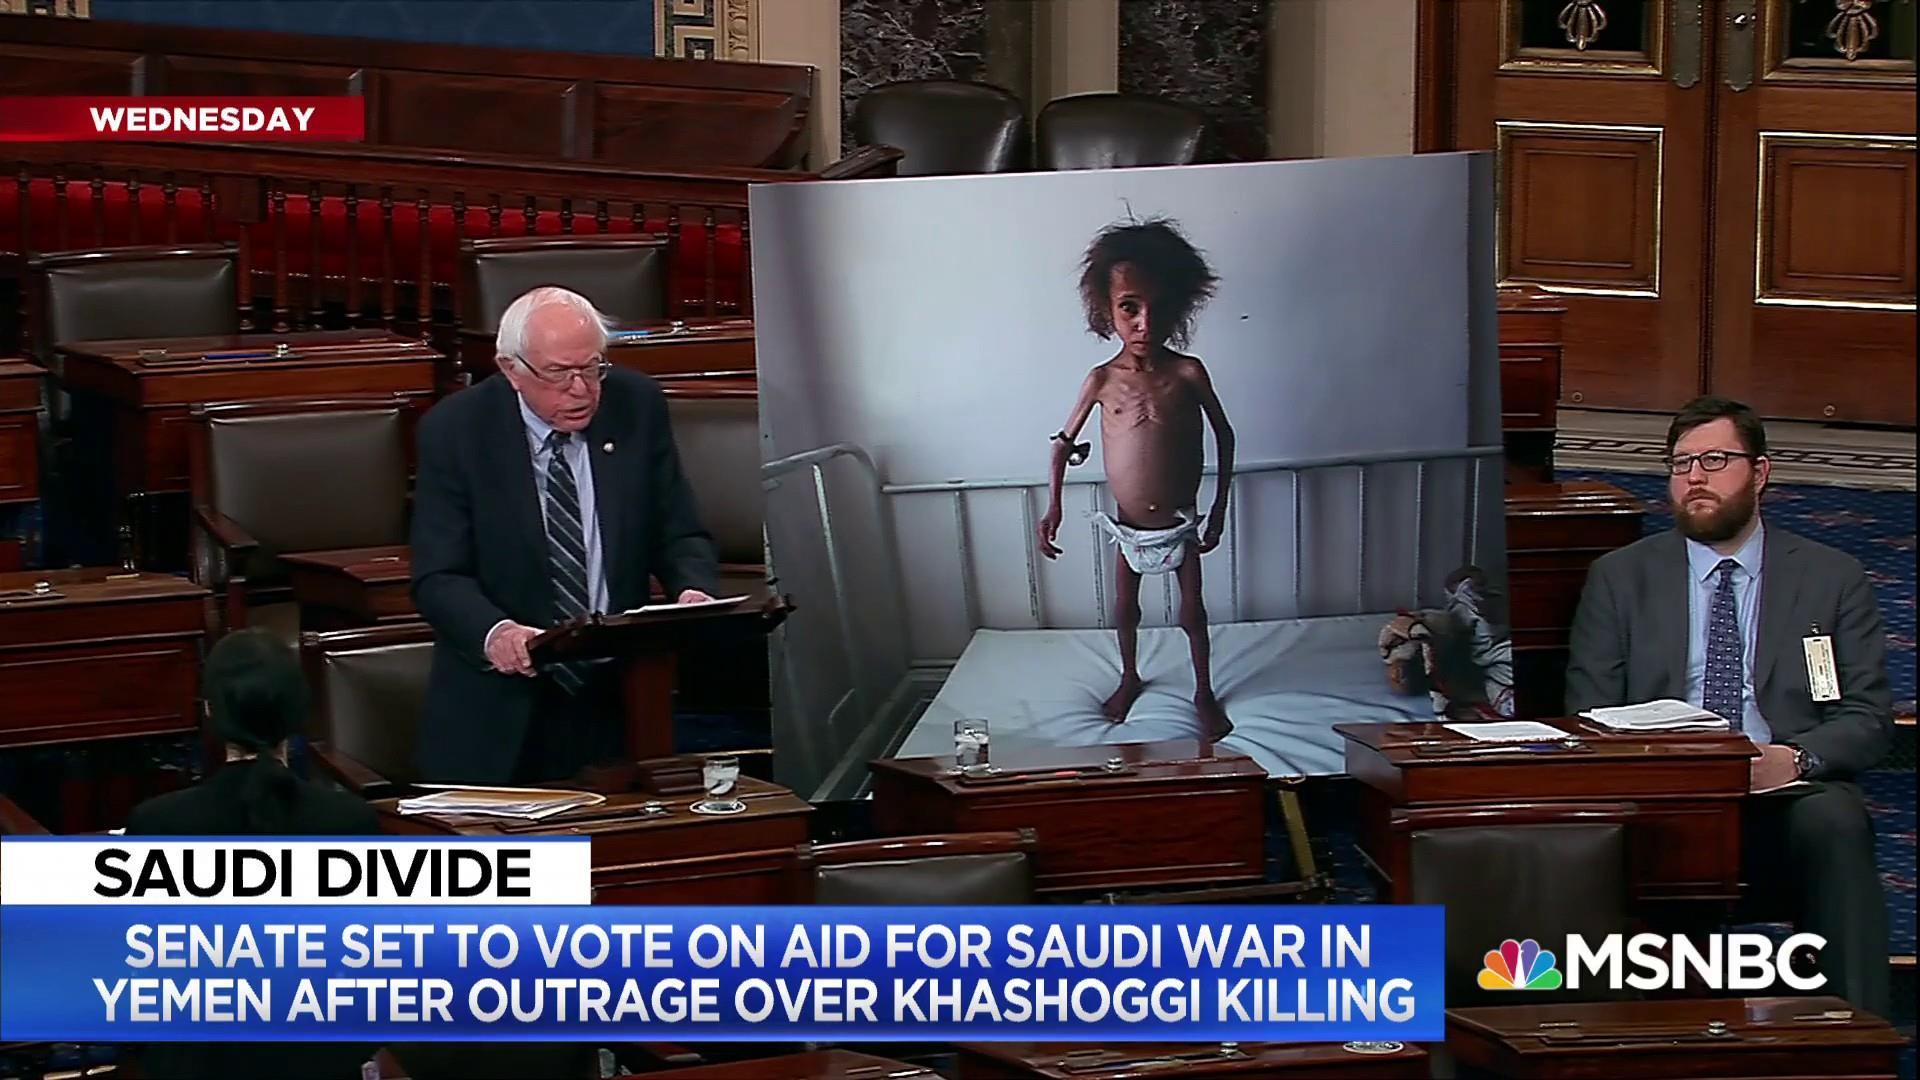 Bernie Sanders: Congress must determine U.S. involvement in Yemen crisis